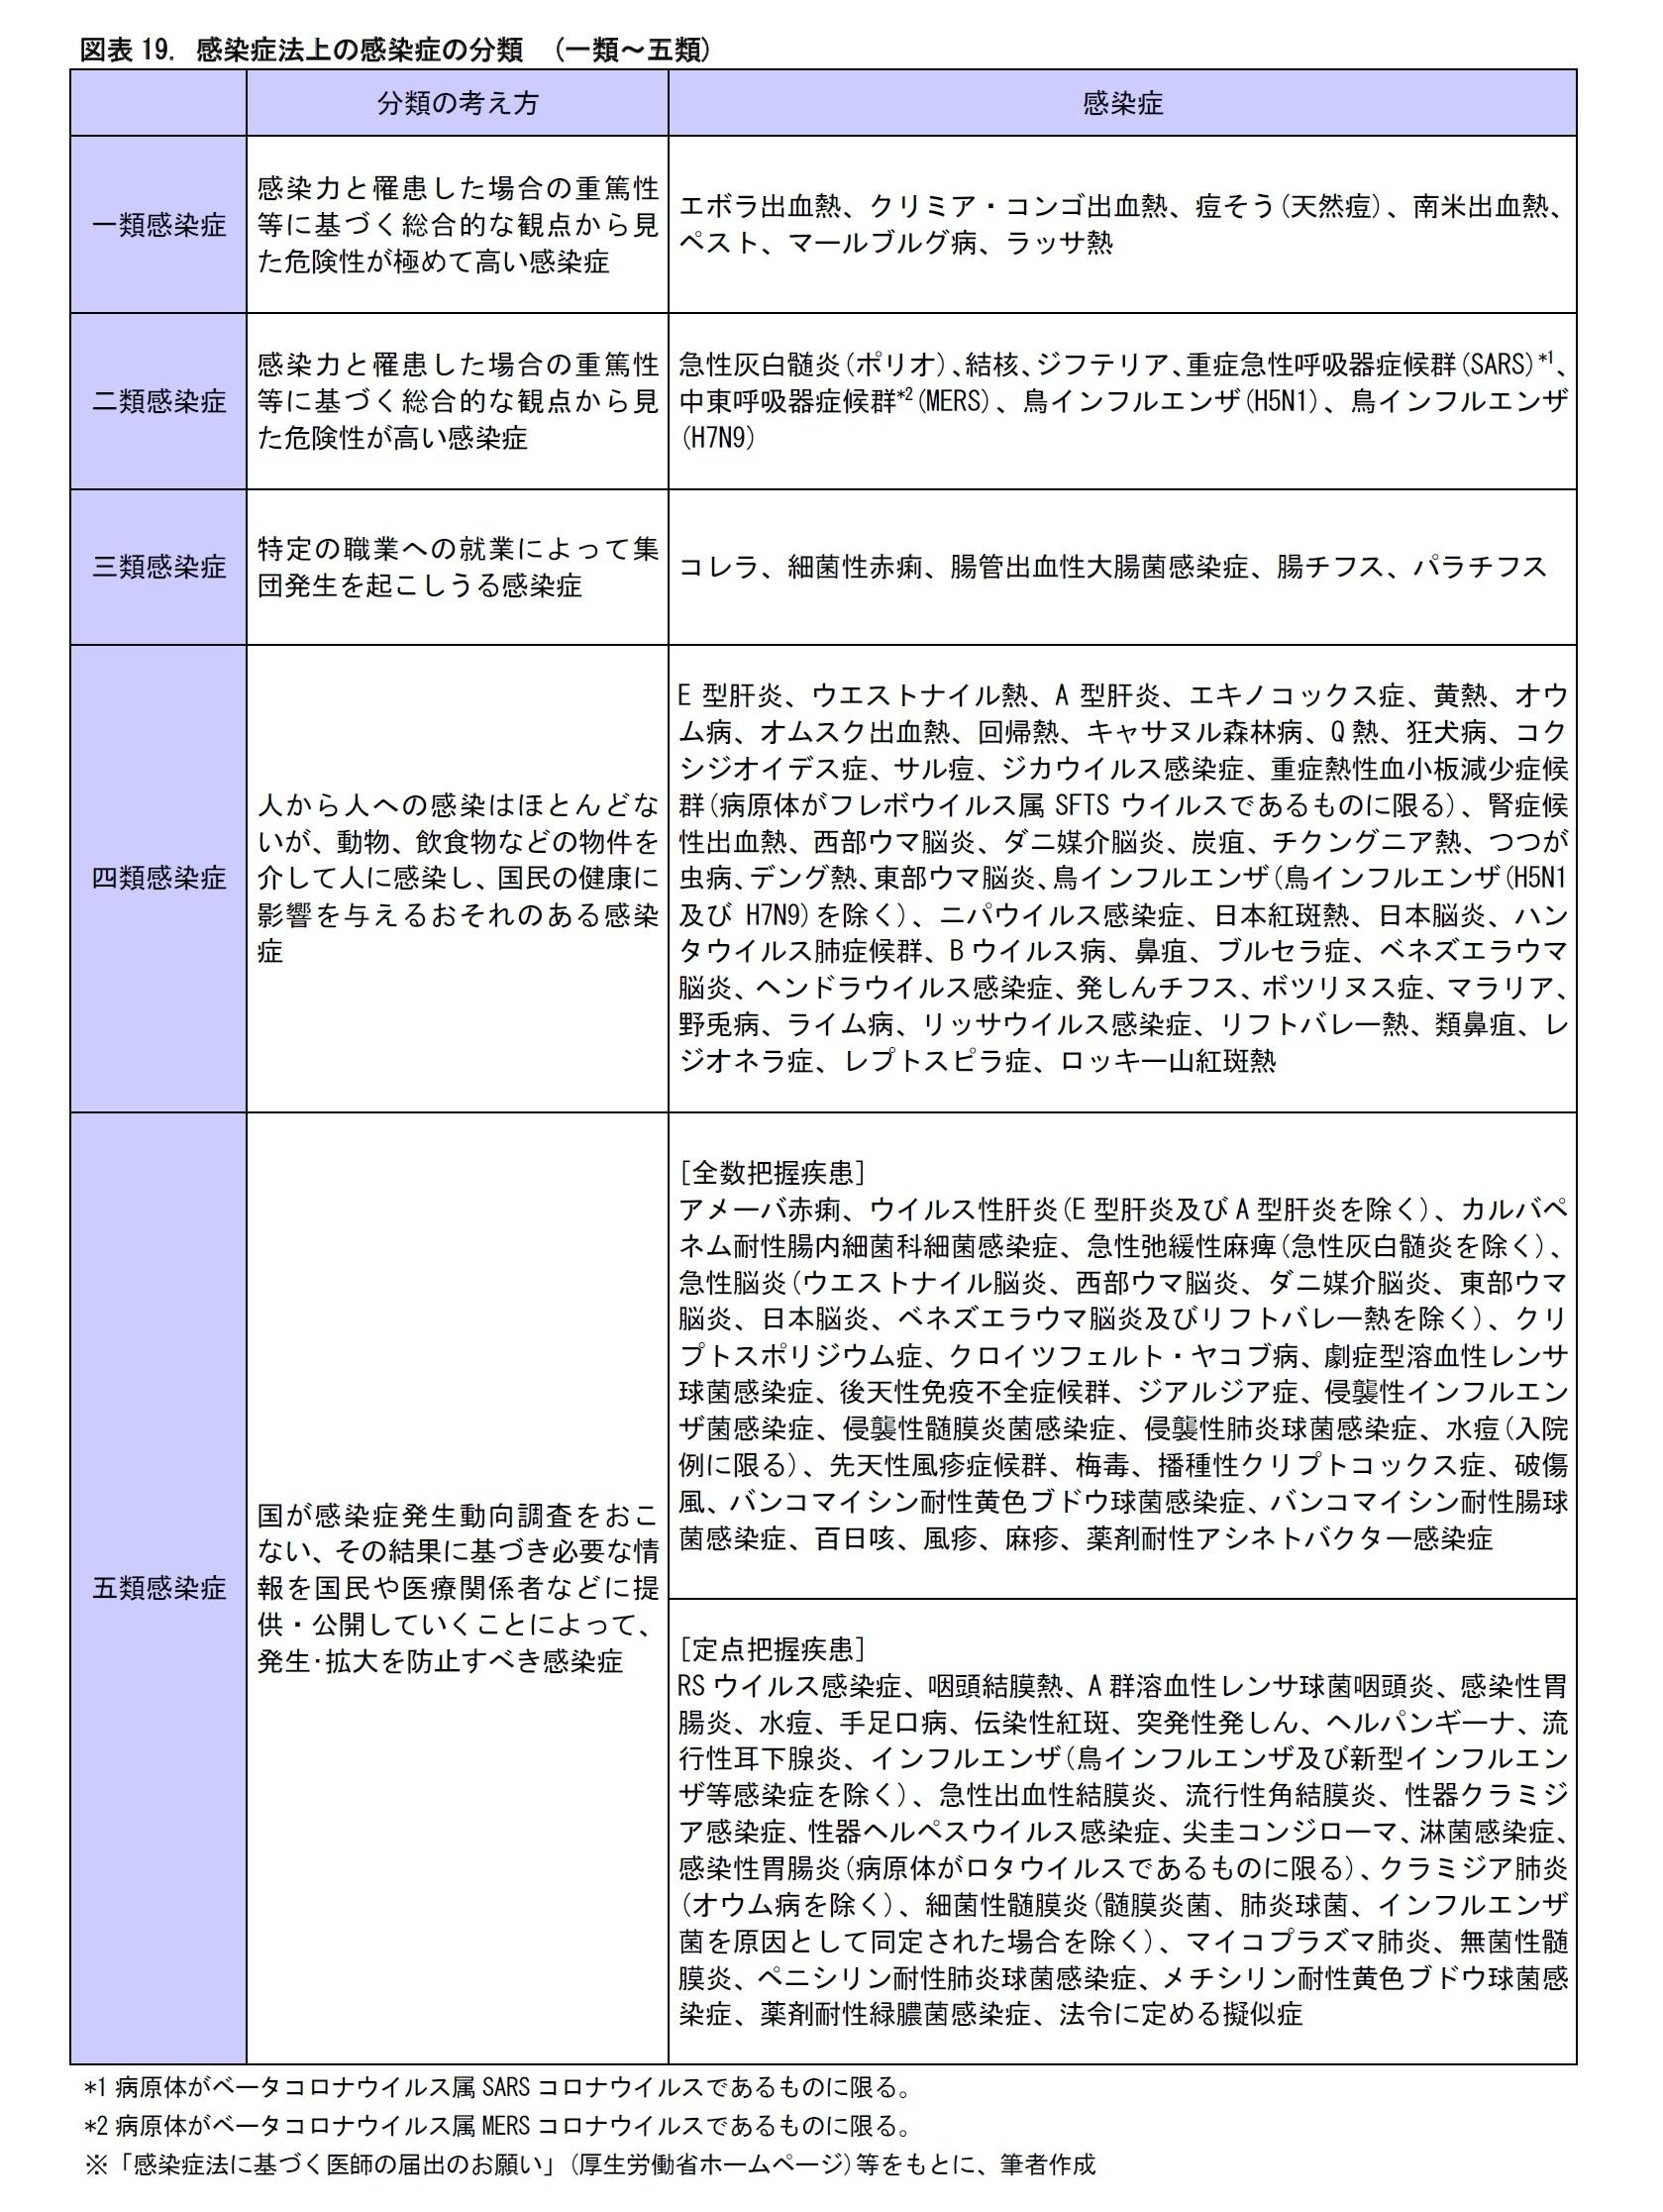 図表19. 感染症法上の感染症の分類 (一類~五類)